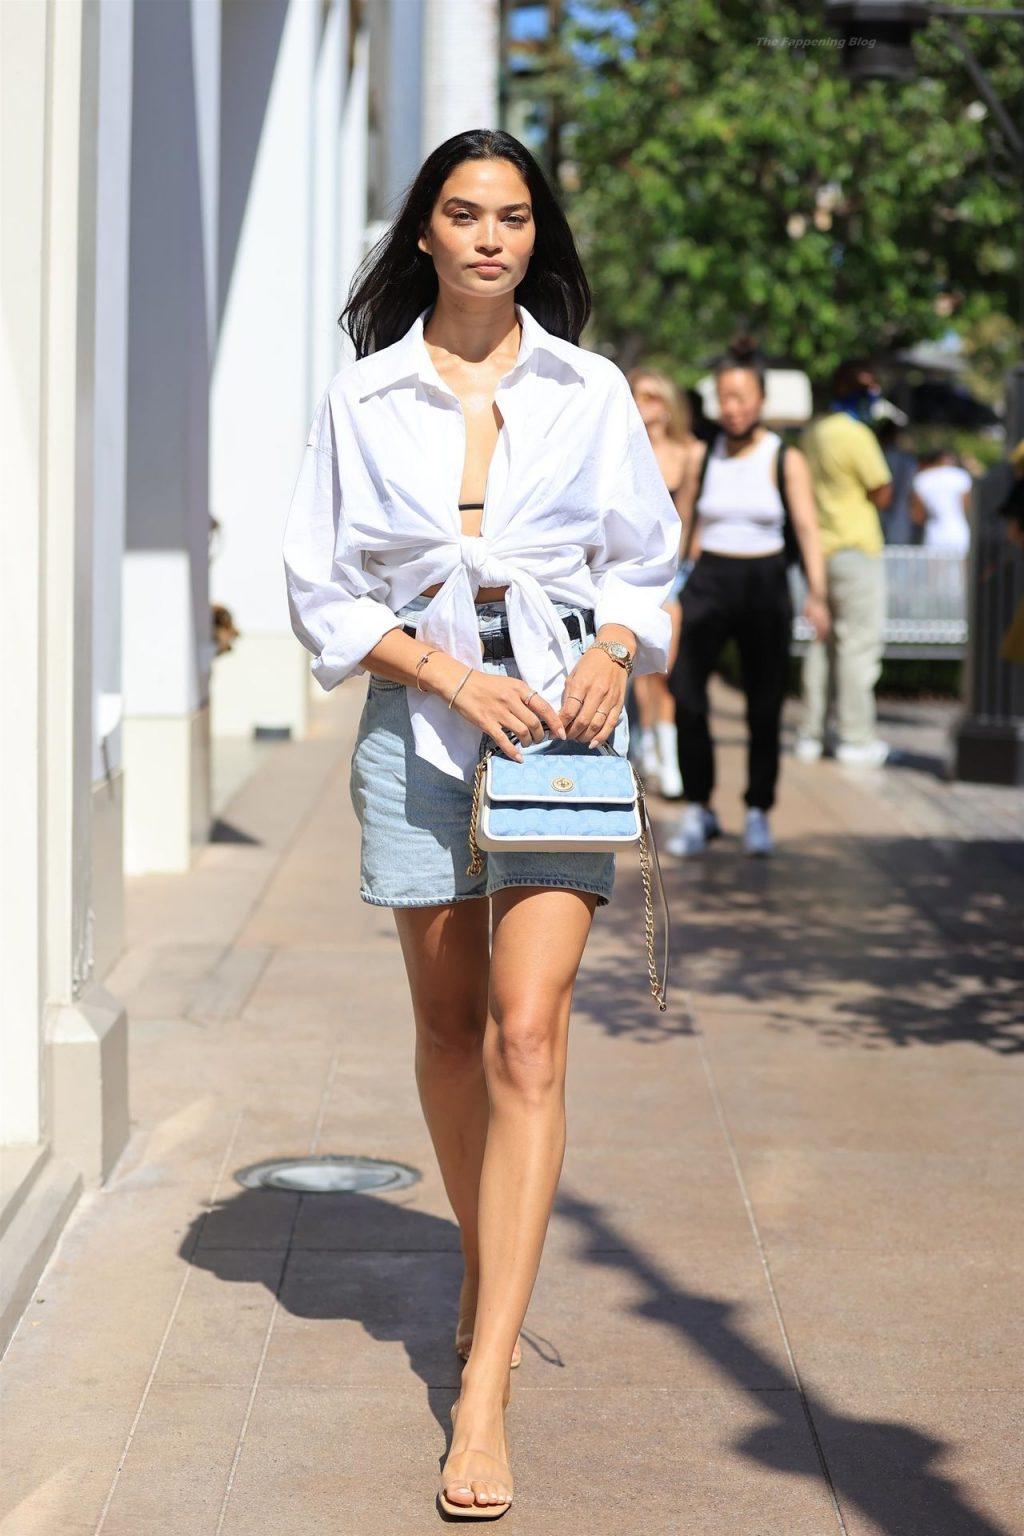 Shanina Shaik Flaunts Her Slender Legs in WeHo (32 Photos)